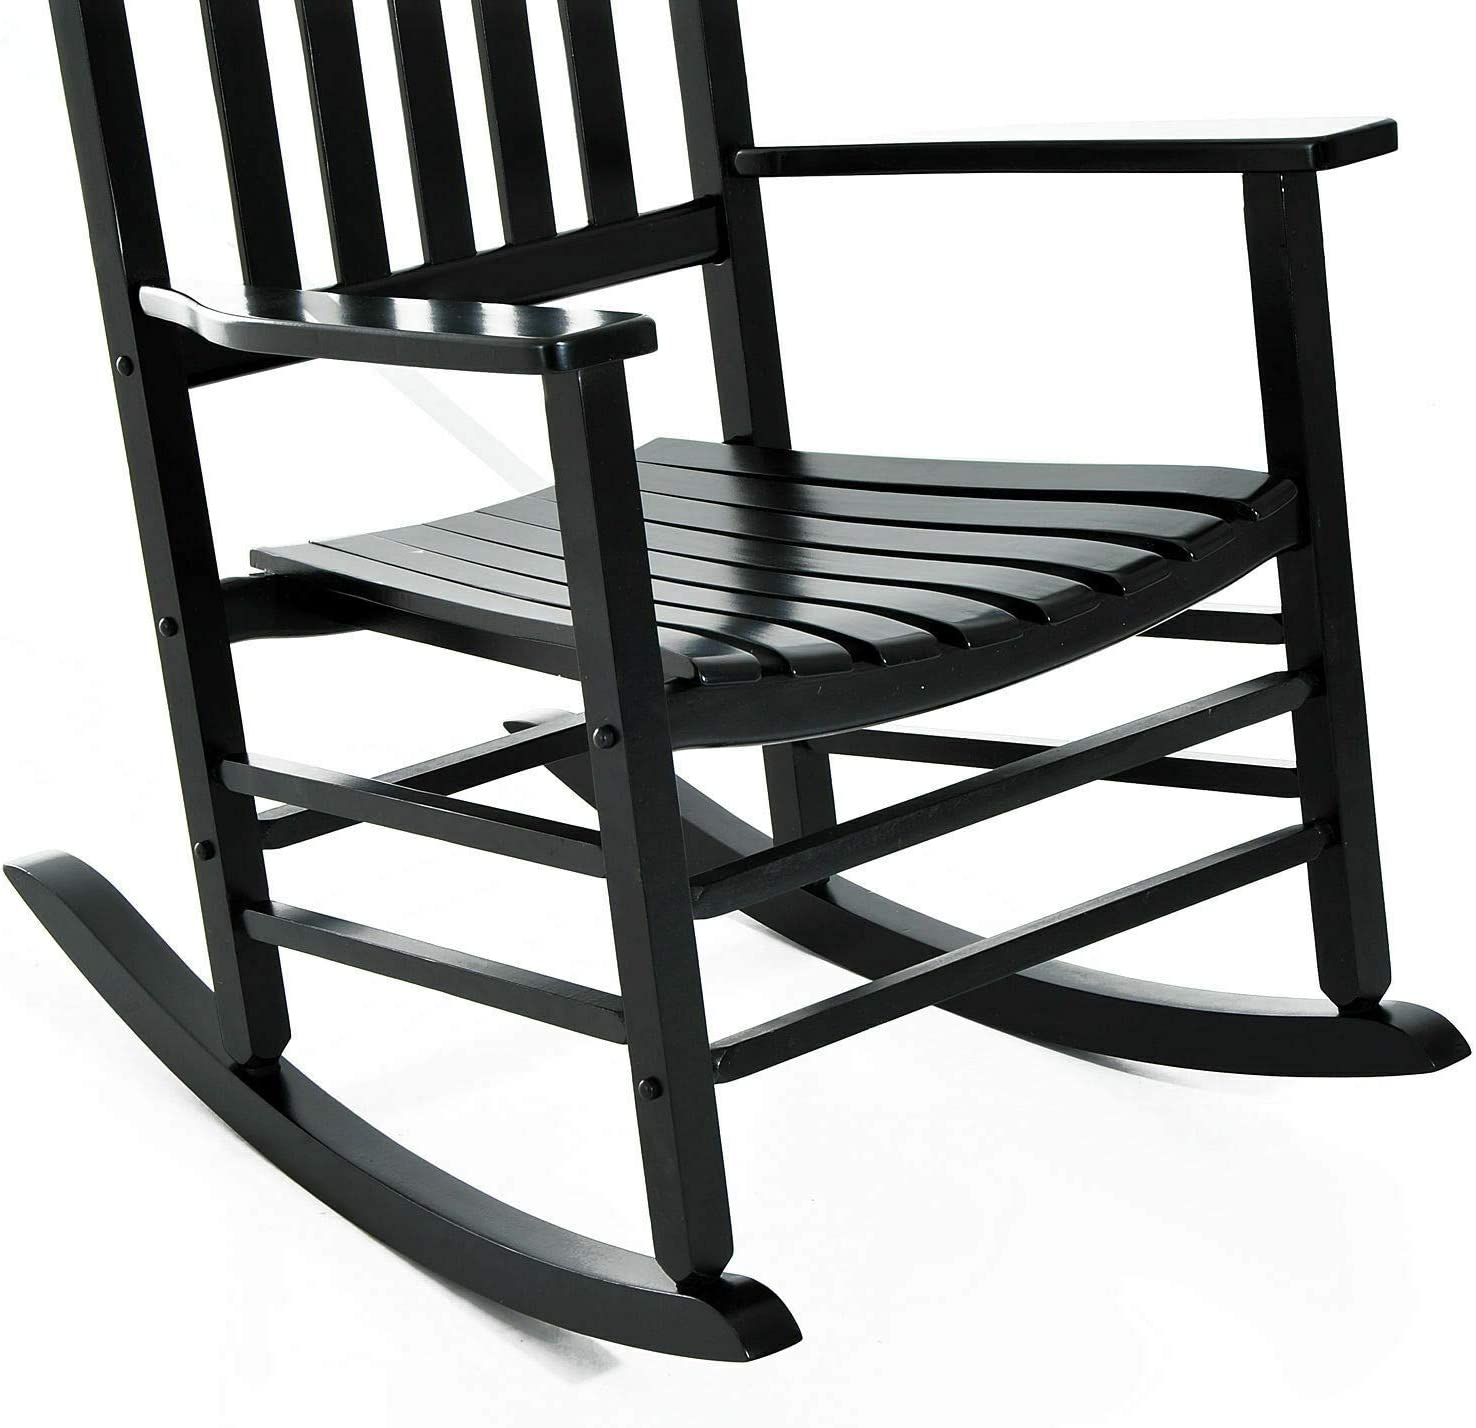 Black Wooden Rocking Chair Rocker Comfortable Armrest Backrest Glider Porch Wide Seat Ergonomically Designed Lightweight Indoor Outdoor Use Home Living Room Bedroom Backyard Balcony Furniture